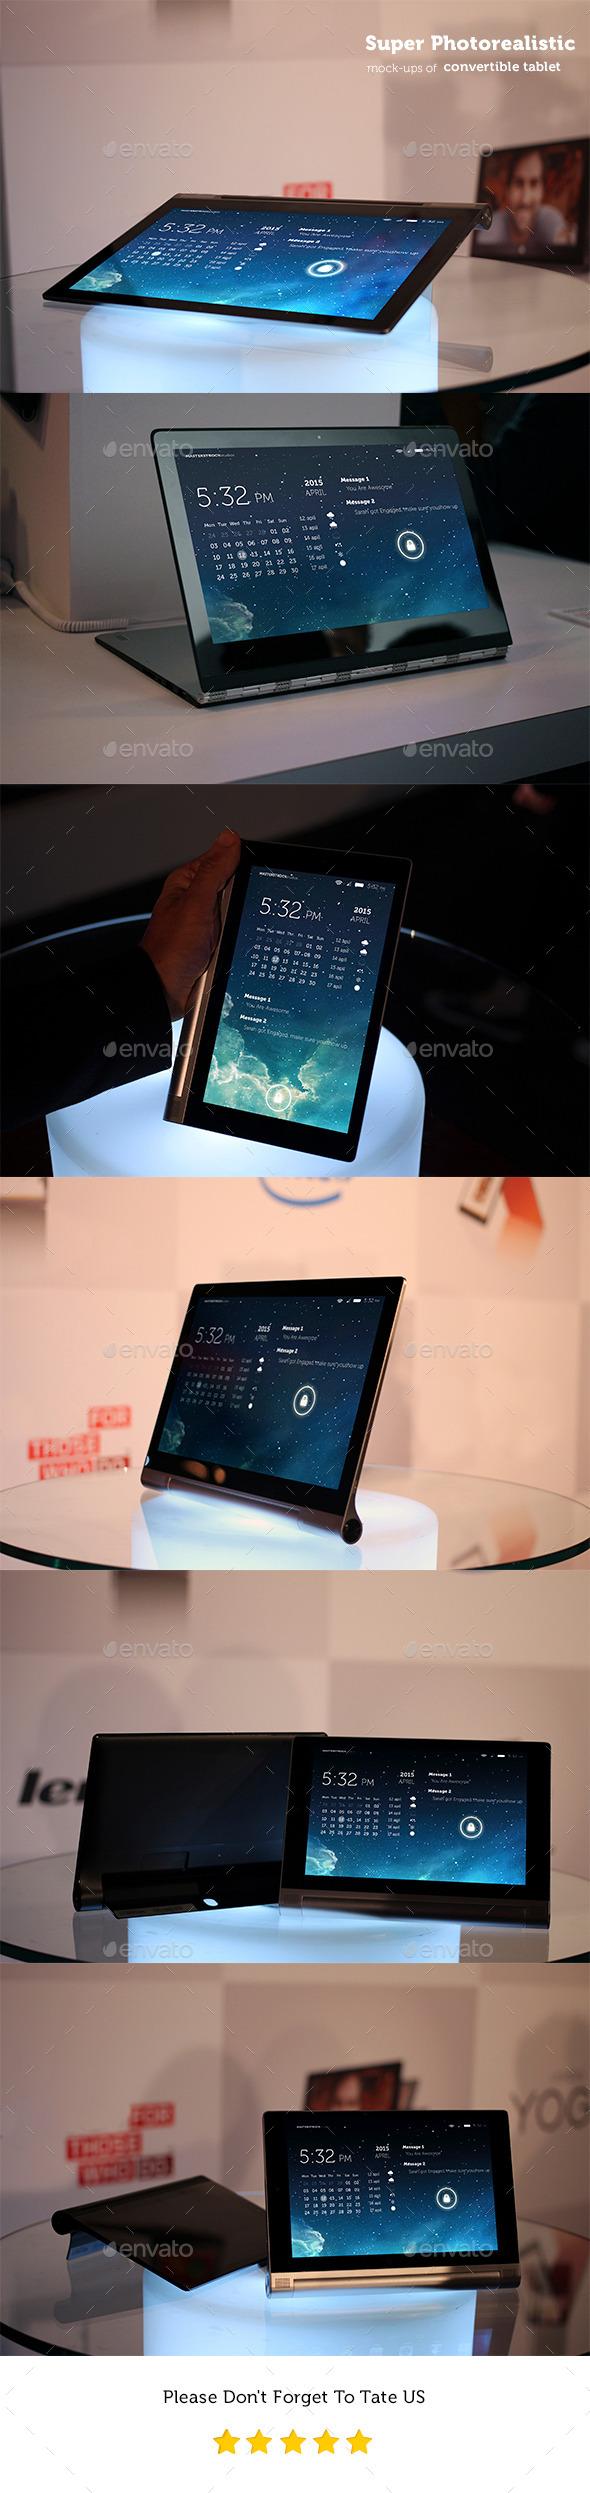 GraphicRiver Photorealistic Pad-Tablet Mockups 11272713